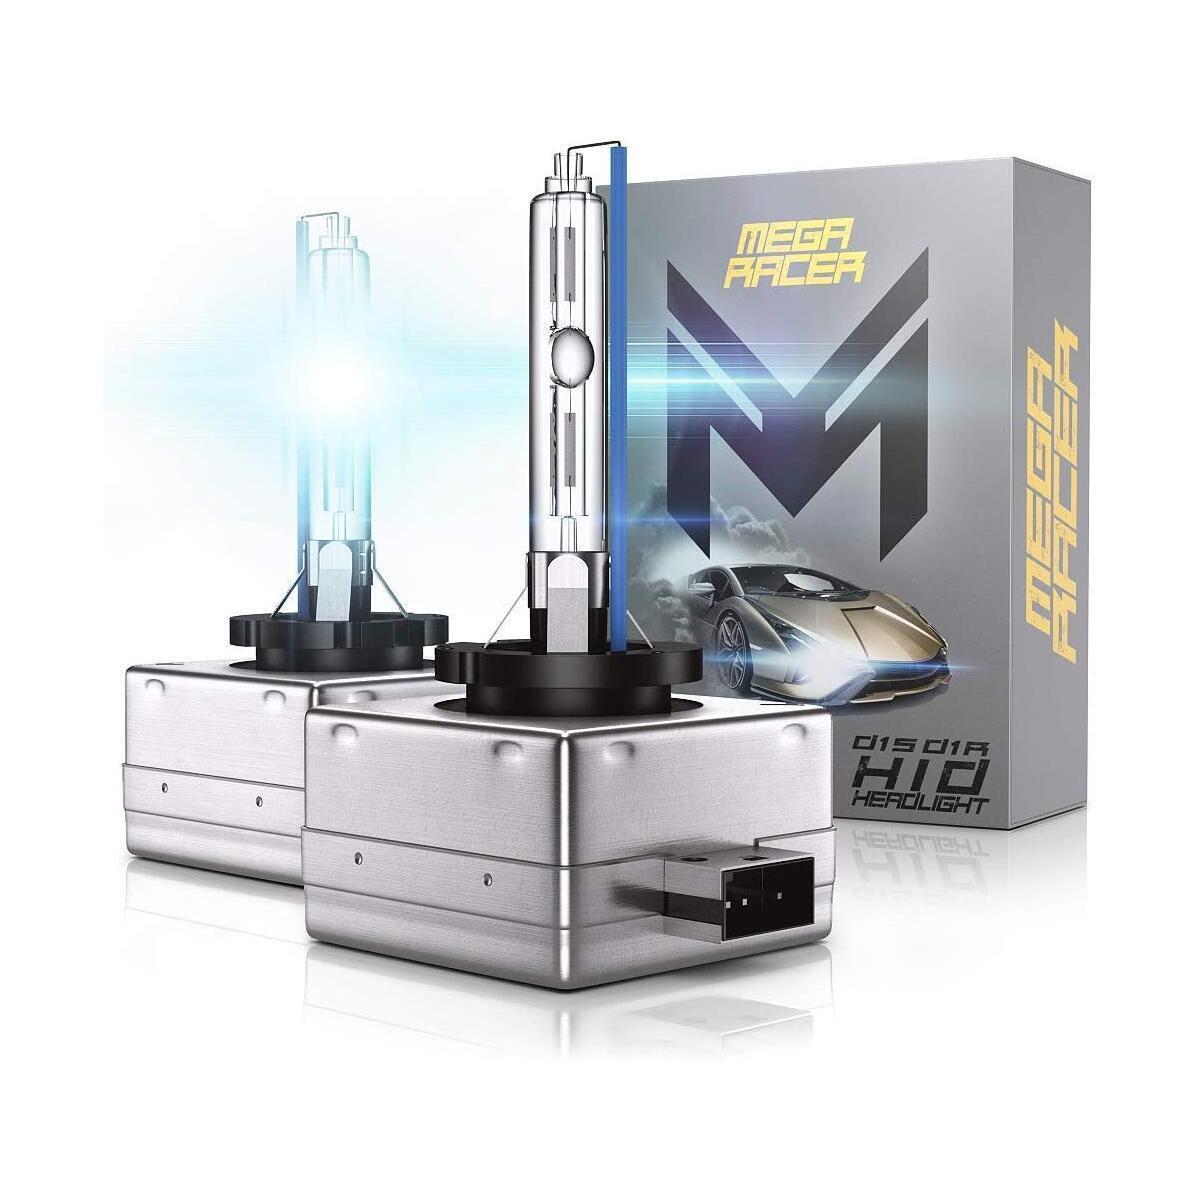 Mega Racer D1C/D1R/D1S HID Headlight Bulb for High Beam Low Beam 35W 10000K Dark Blue 8000 Lumens Xenon Headlights IP68 Waterproof, Pack of 2